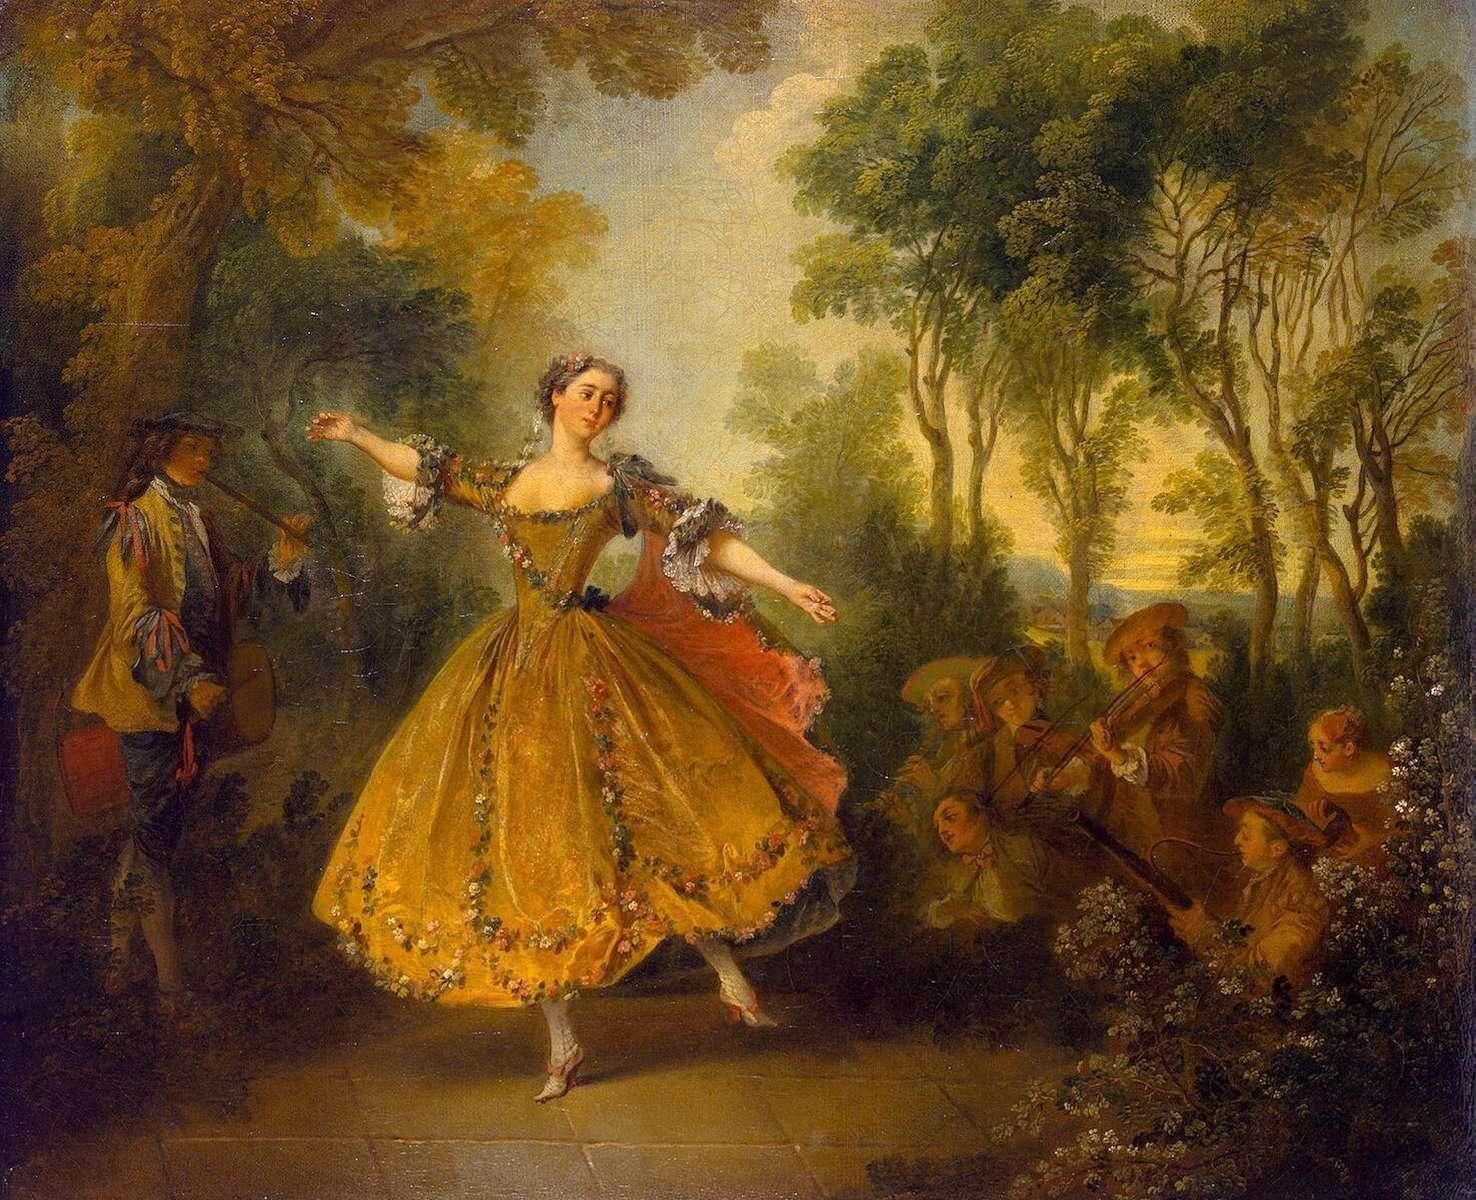 Dipinto della ballerina del Romanticismo